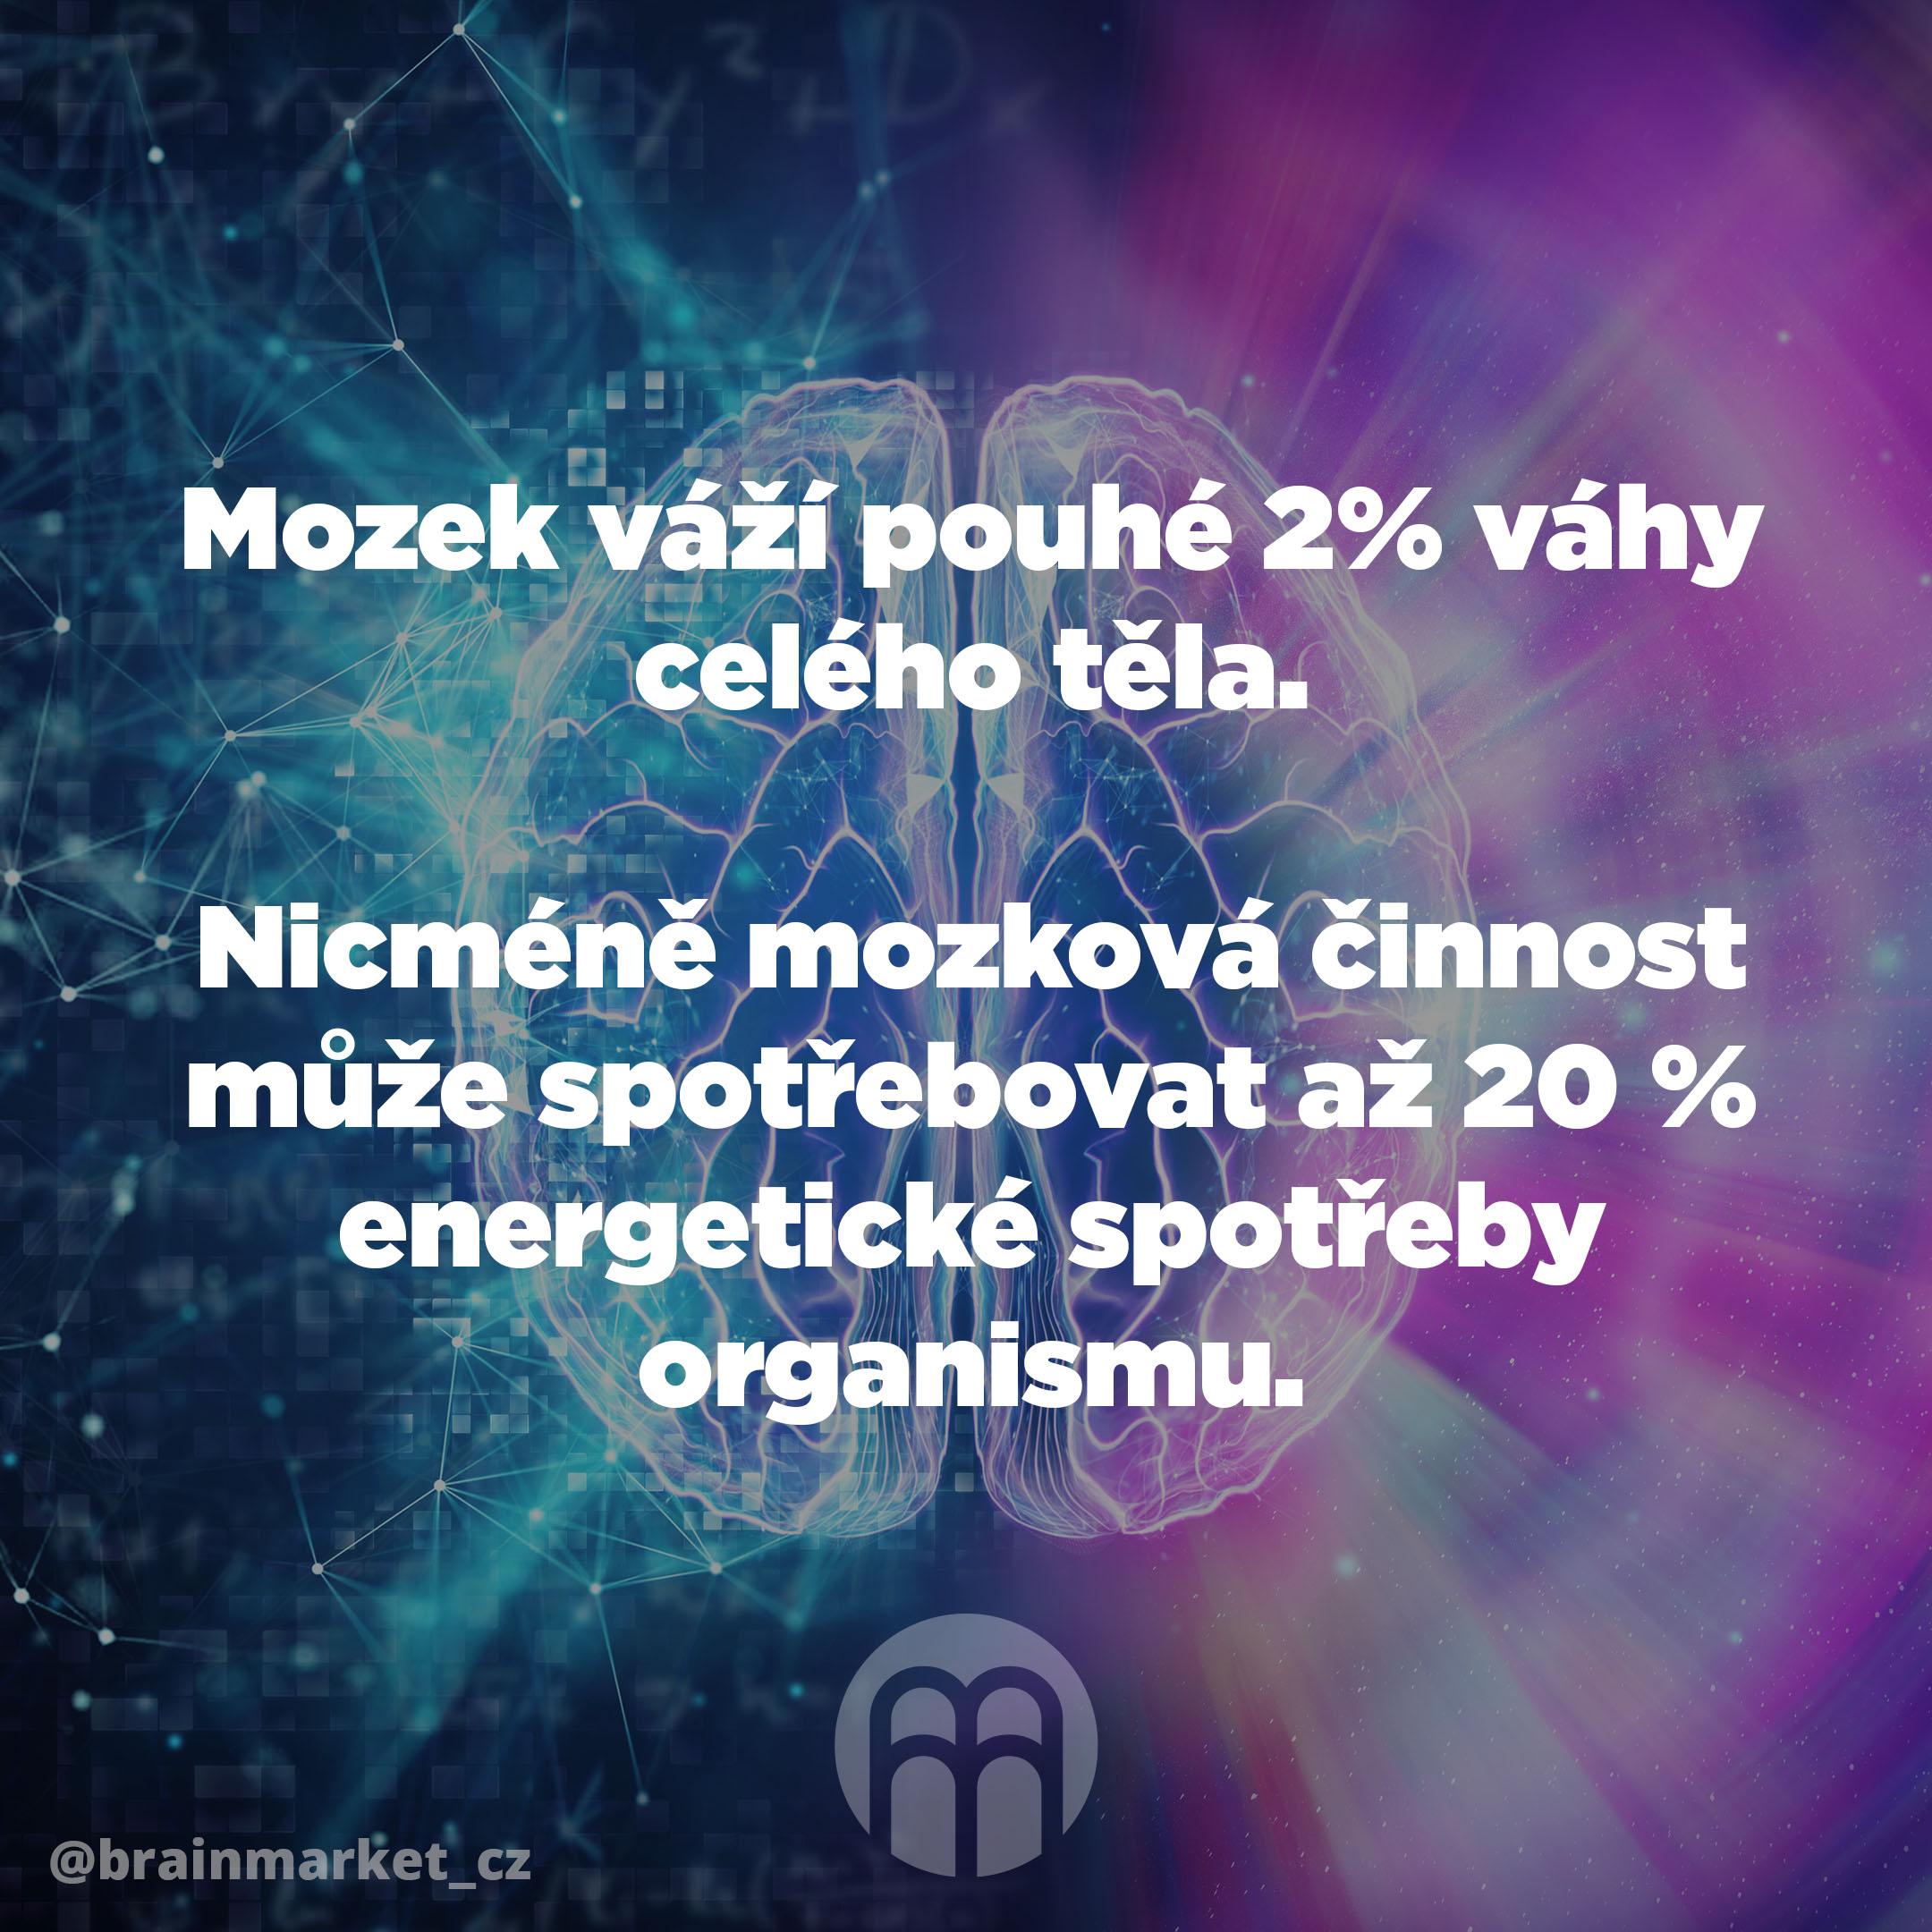 mozek_vazi_pouhe_2_procenta